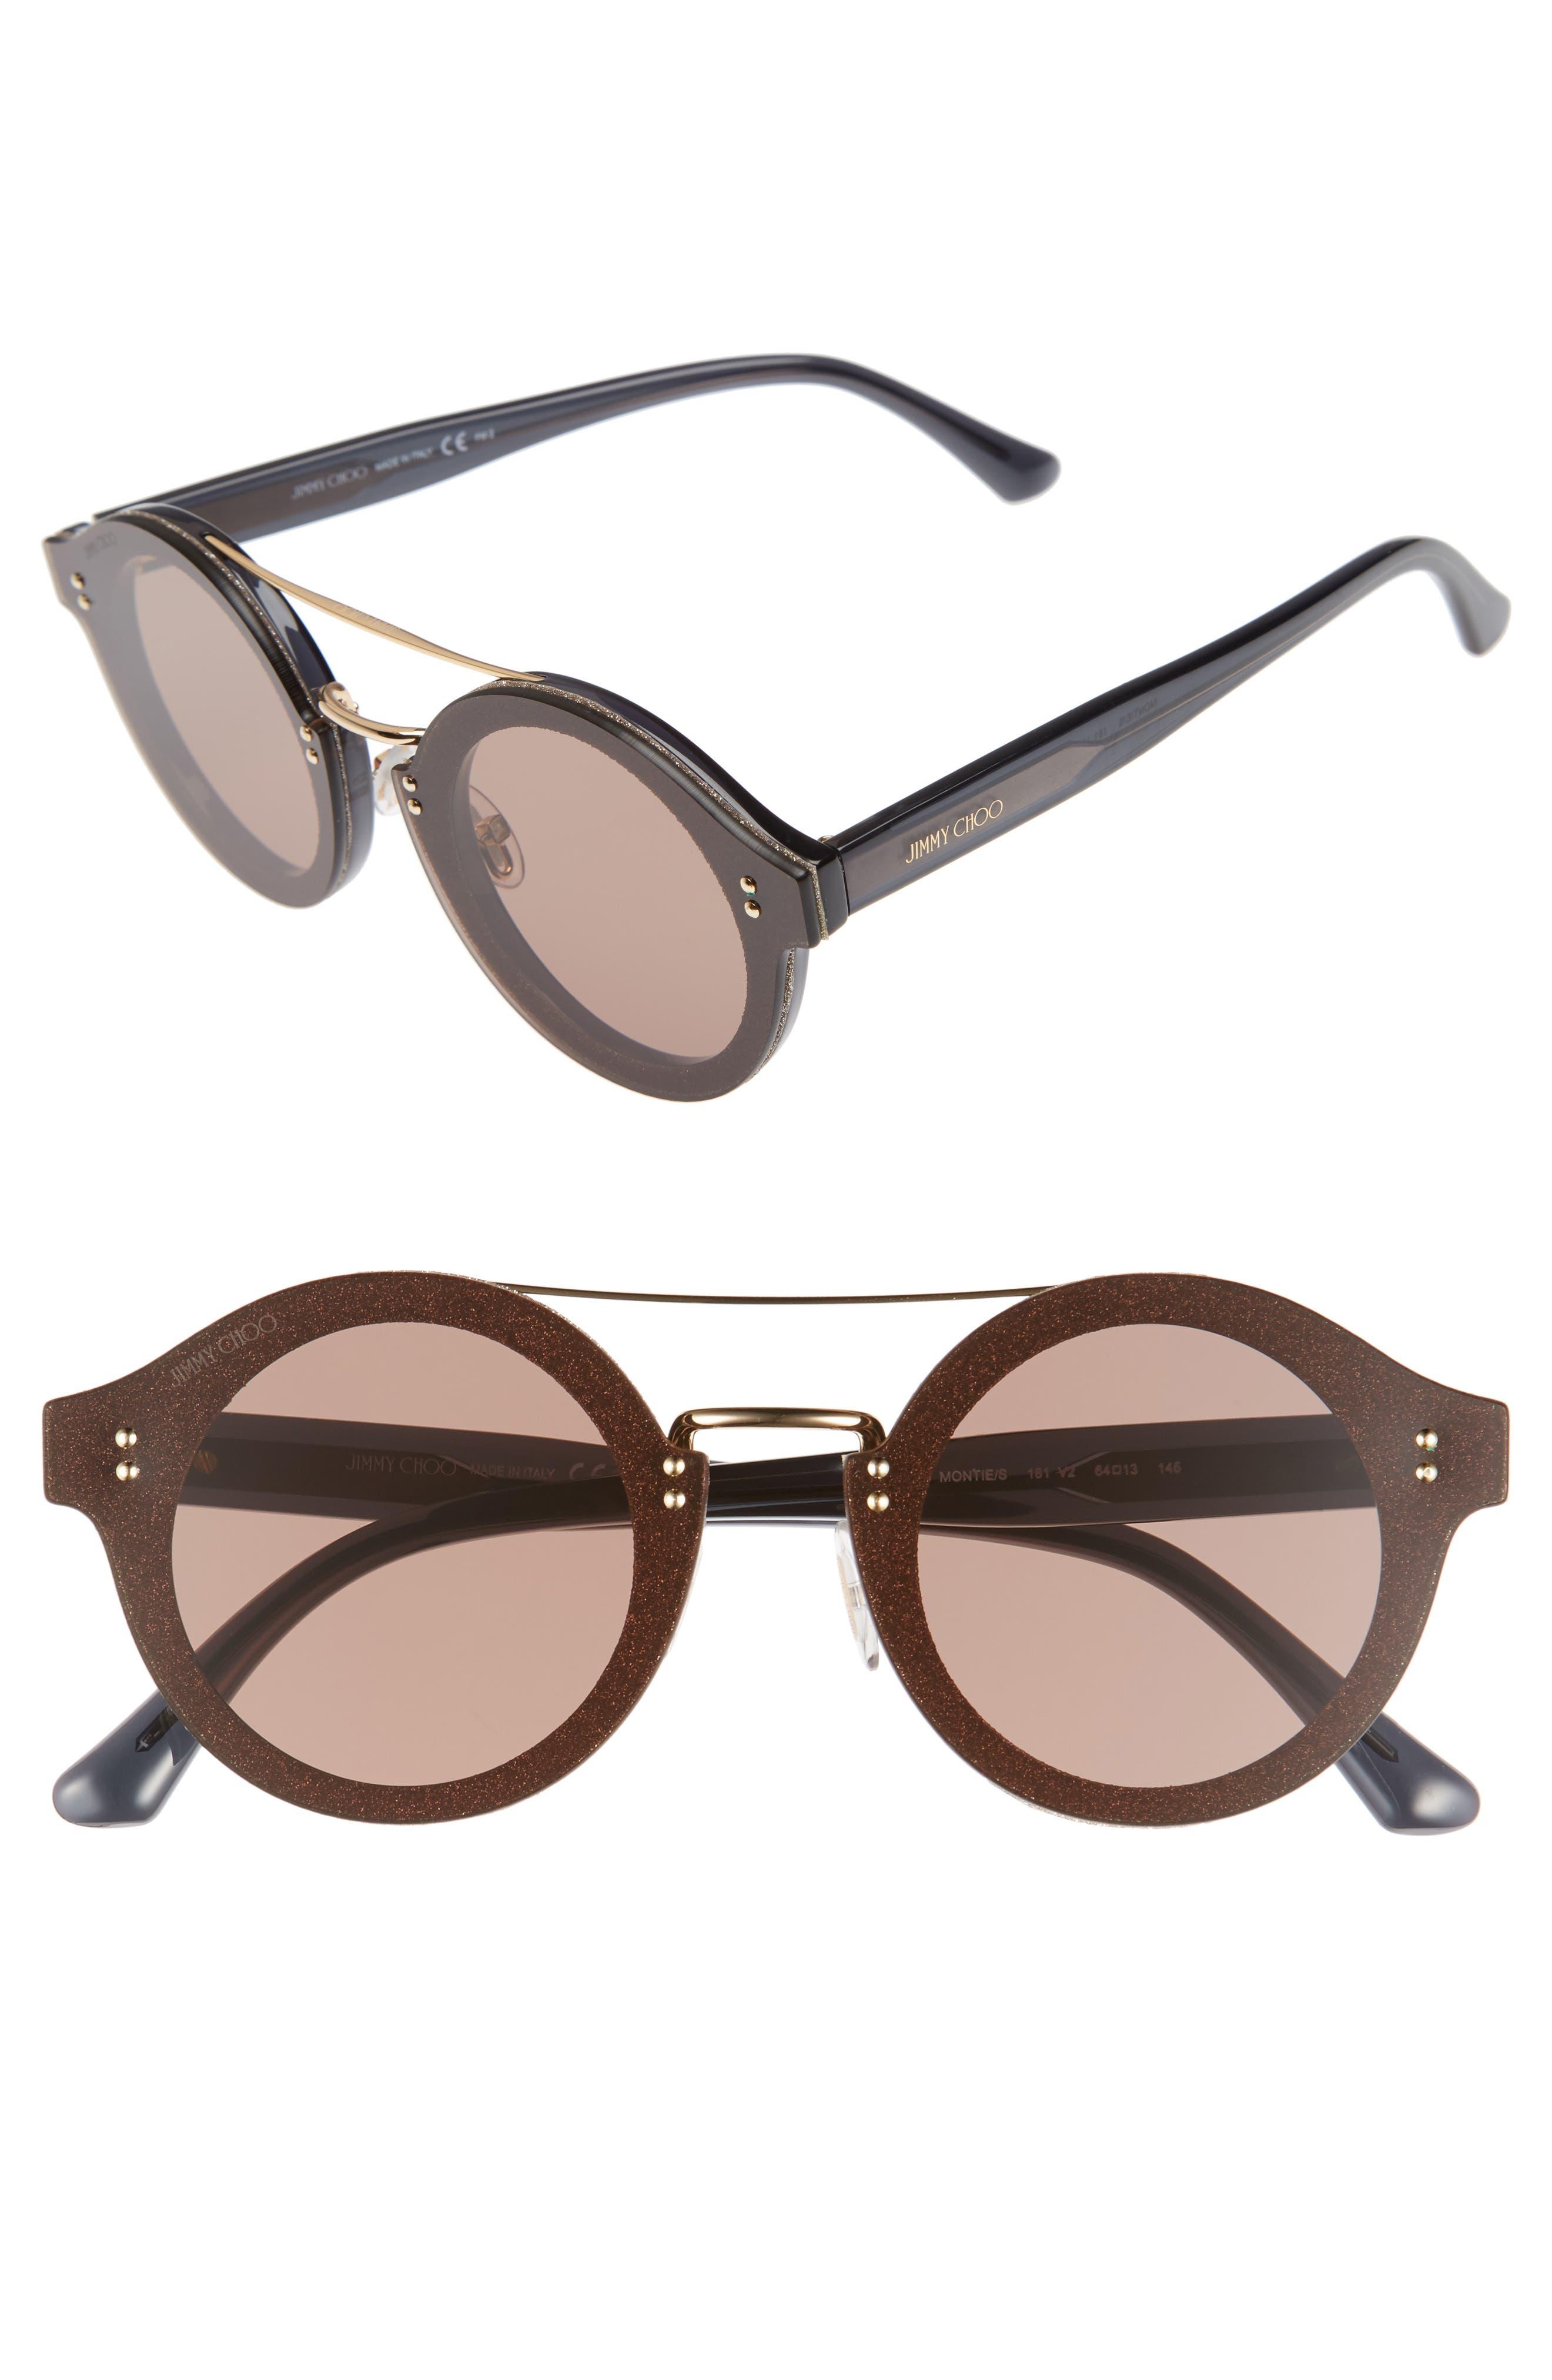 Monties 64mm Round Sunglasses,                         Main,                         color, Dark Grey/ Glitter/ Gold